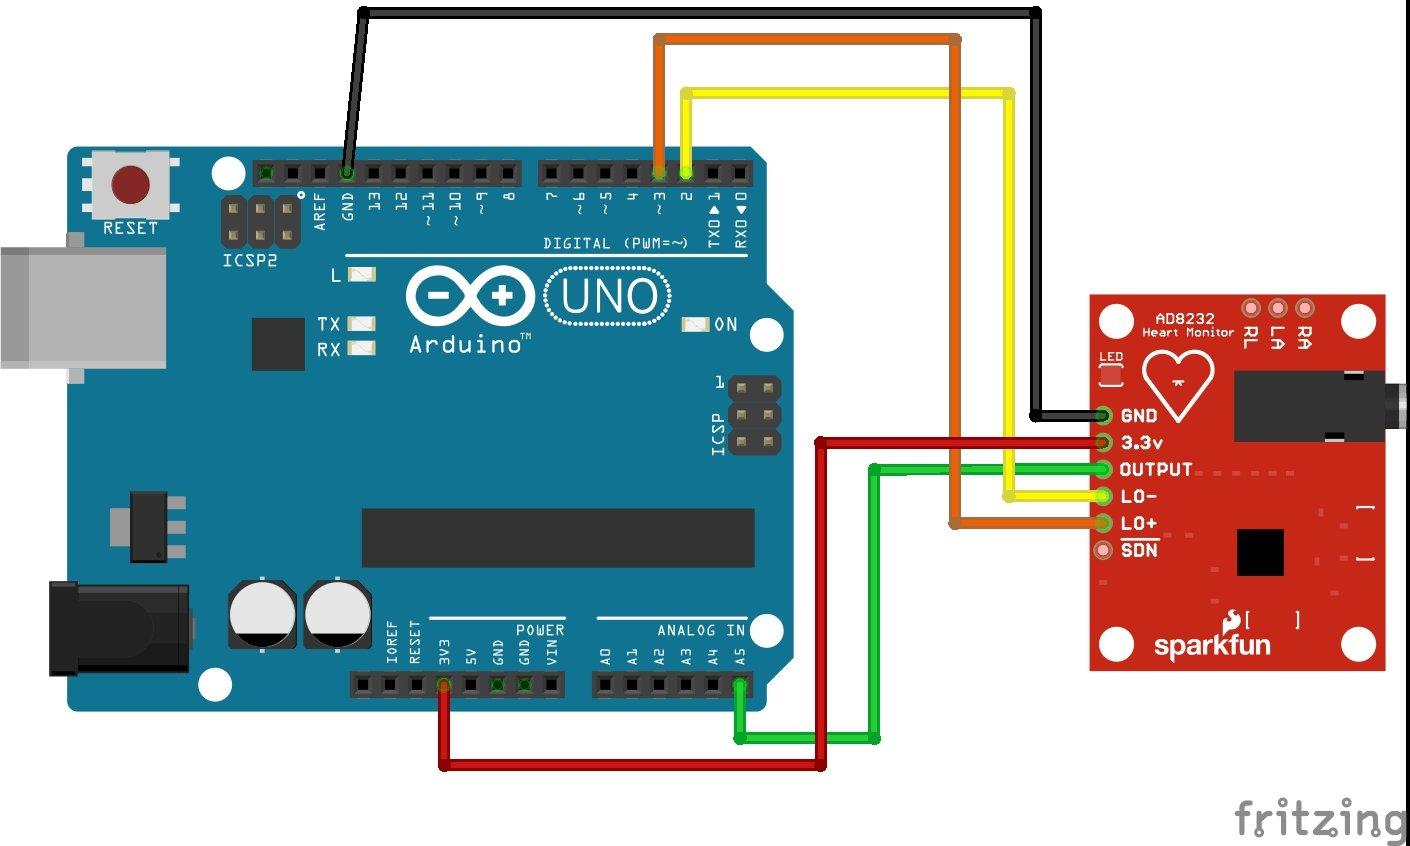 AD8232 ECG Module interfacing with Arduino